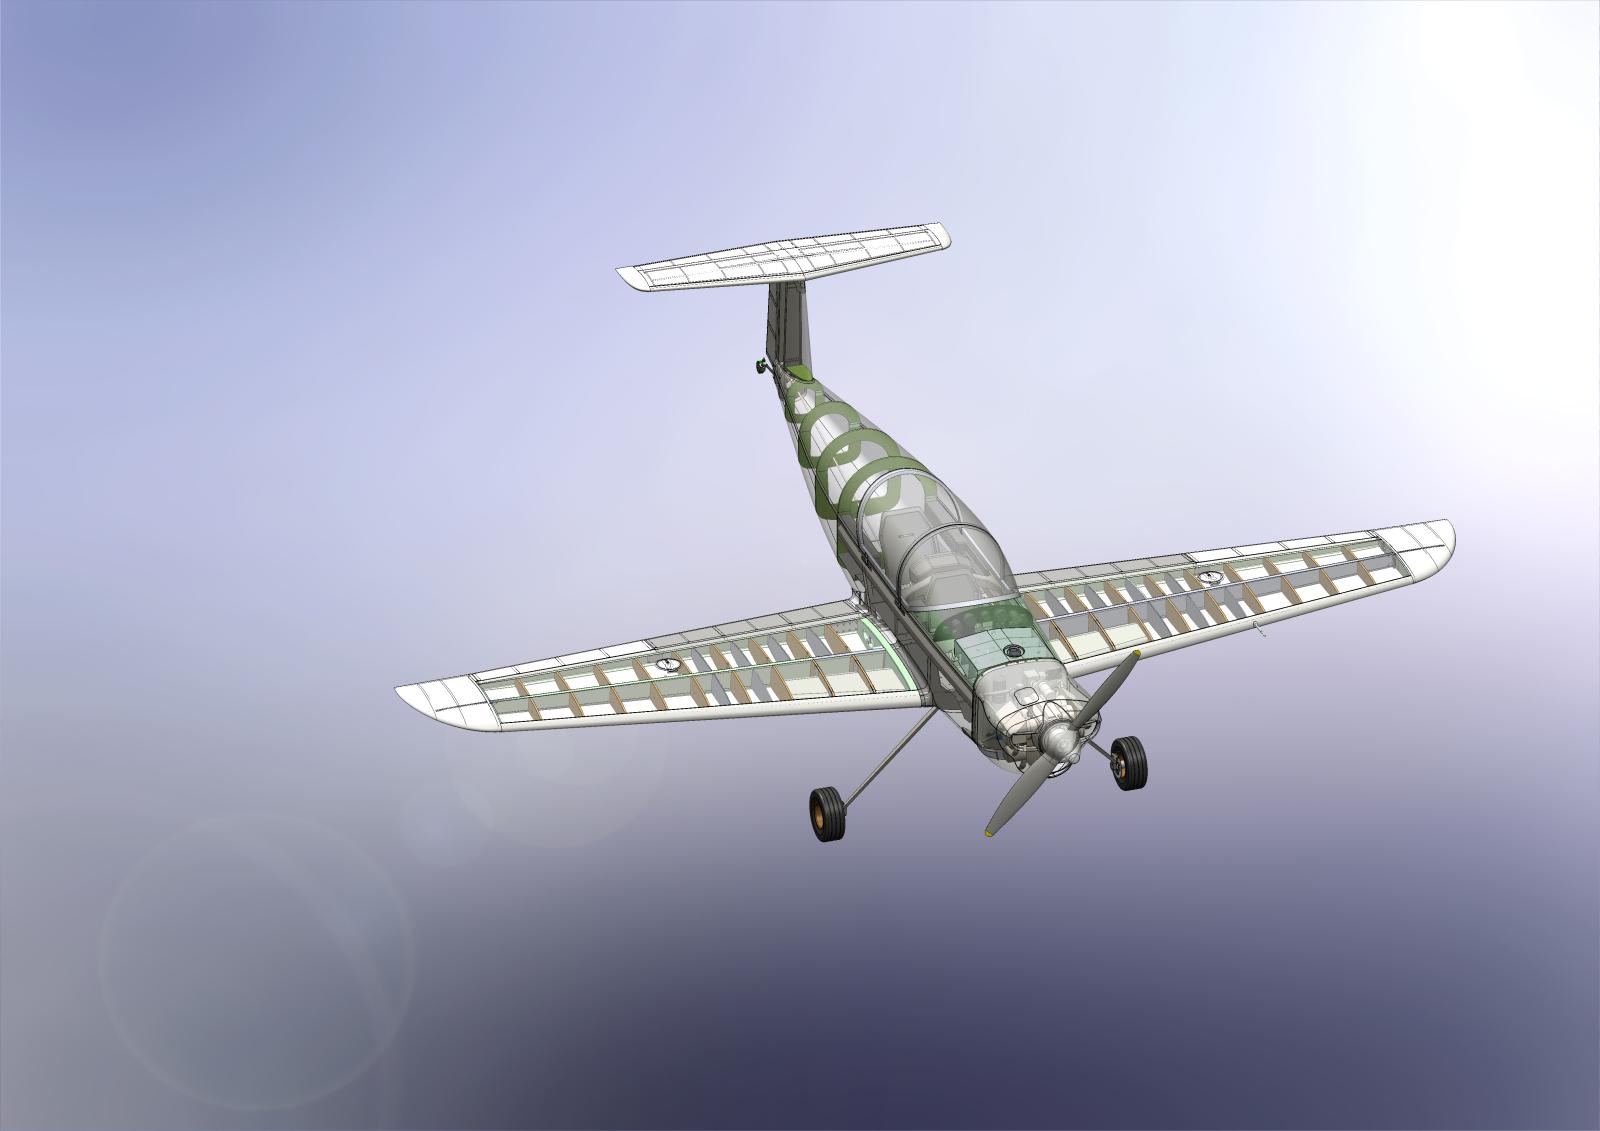 V-King Kingfisher KF2200 -Exclusivo Defensa Nacional y del Mundo- F262pu